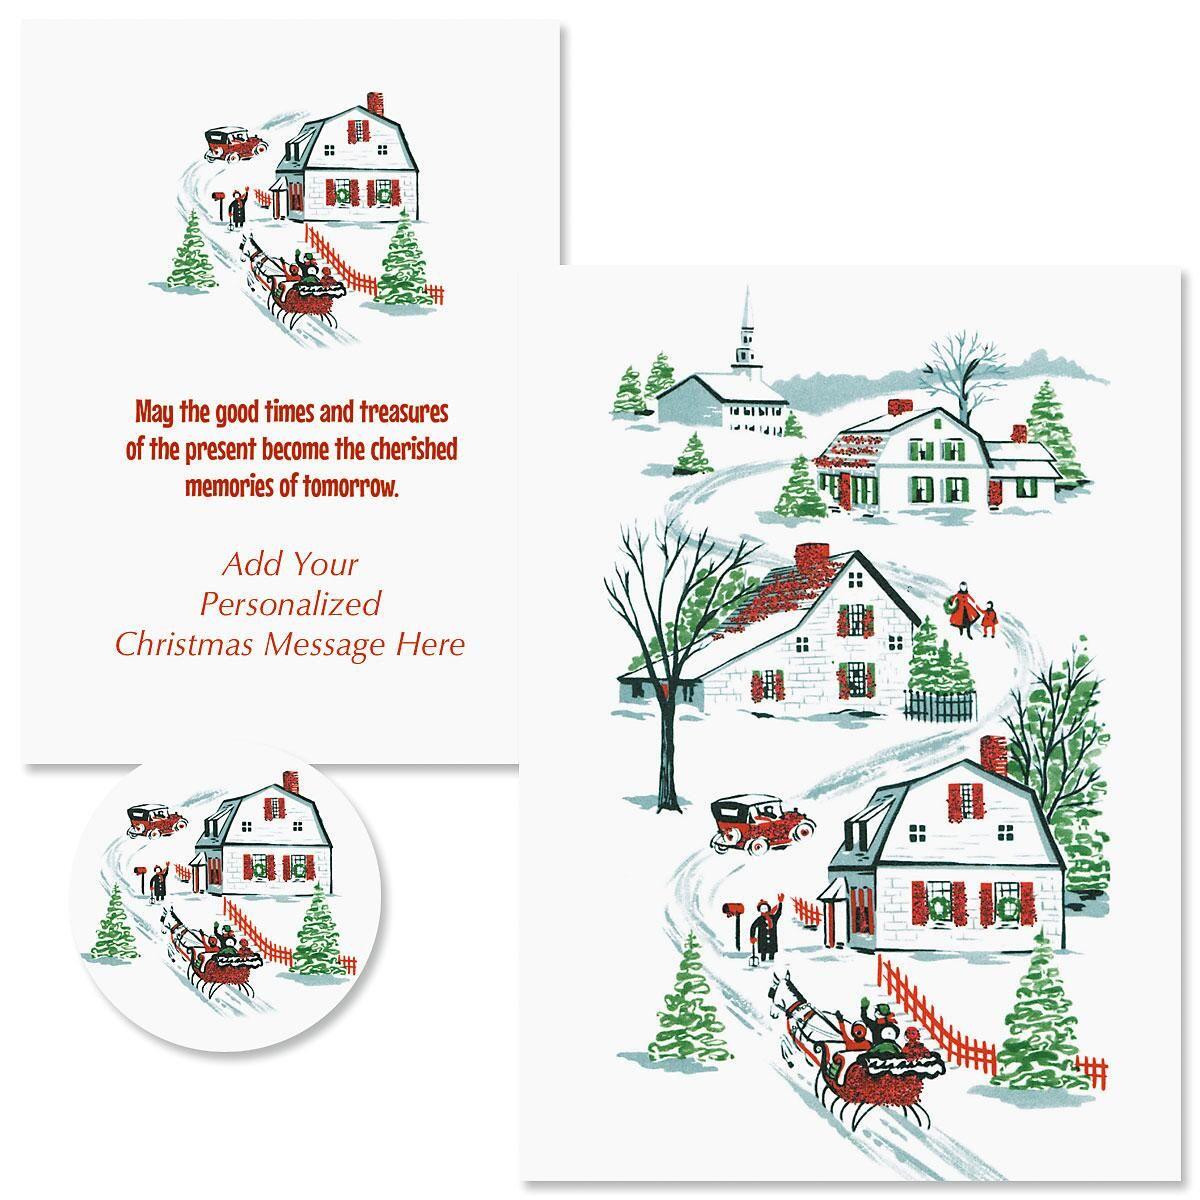 Nostalgic Memories Christmas Cards - Personalized